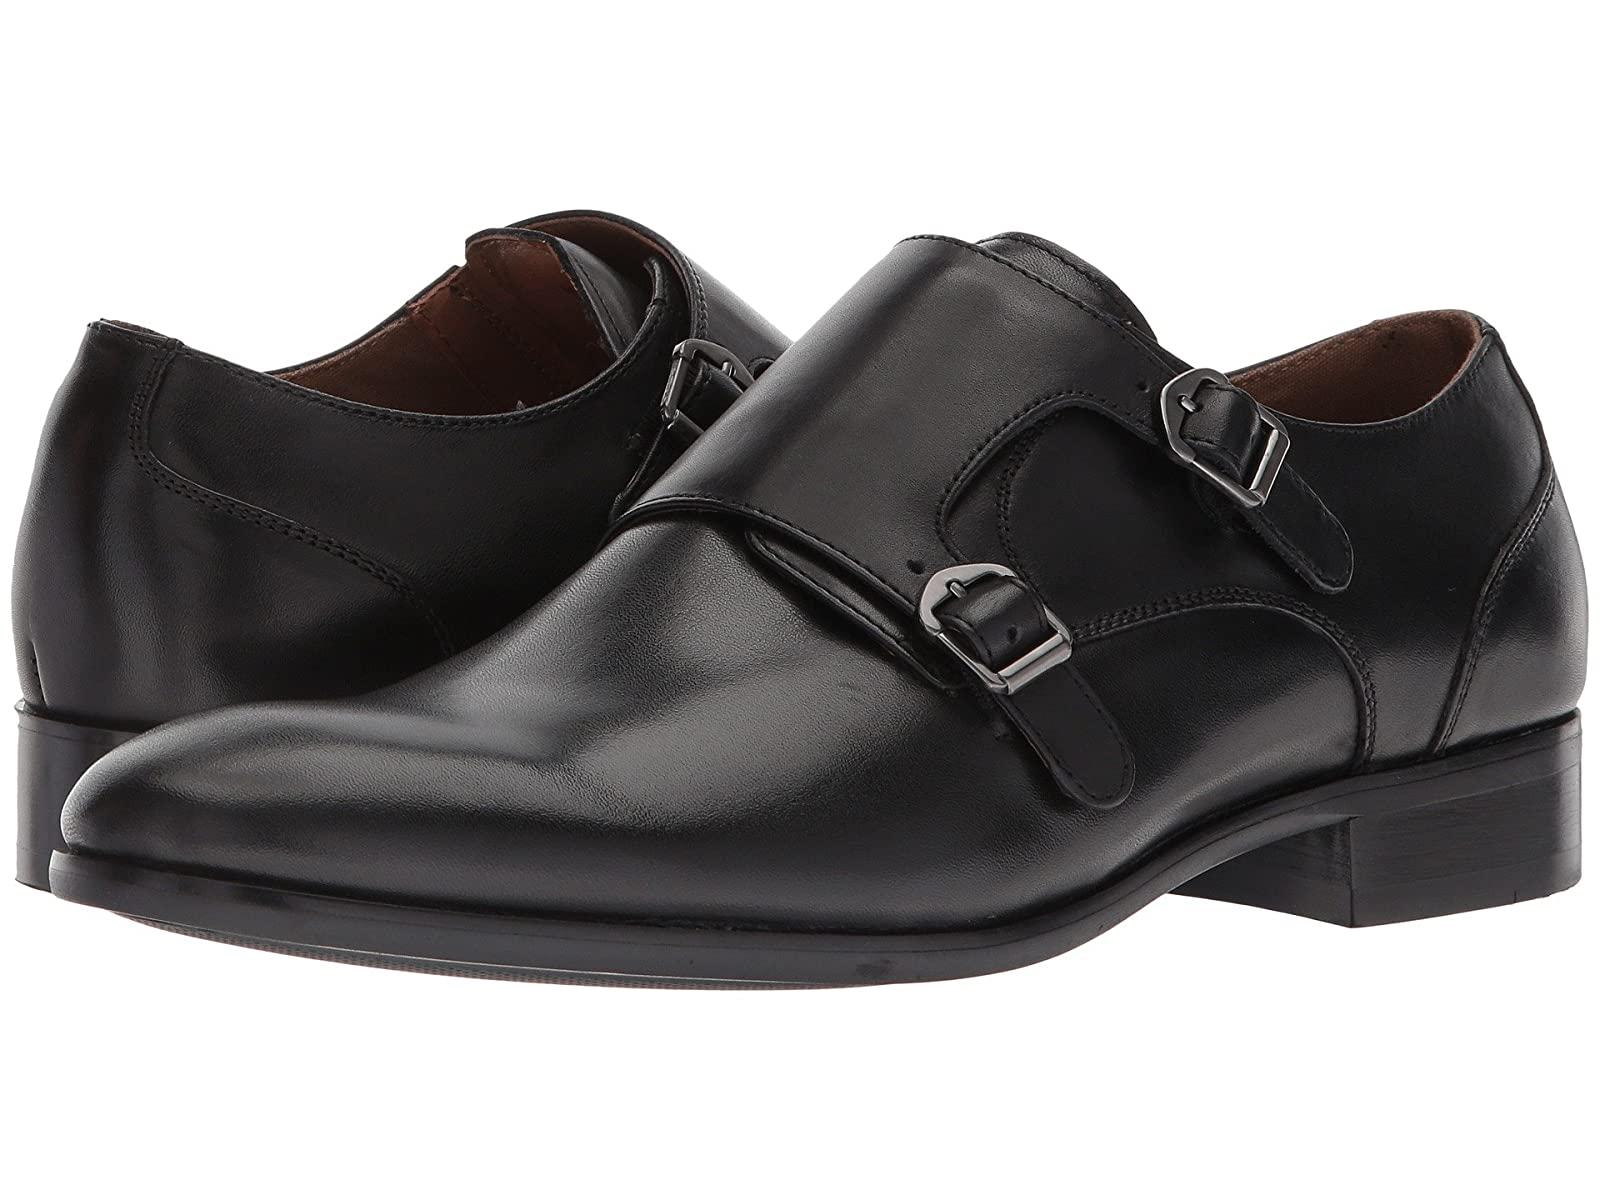 ALDO SartanoCheap and distinctive eye-catching shoes